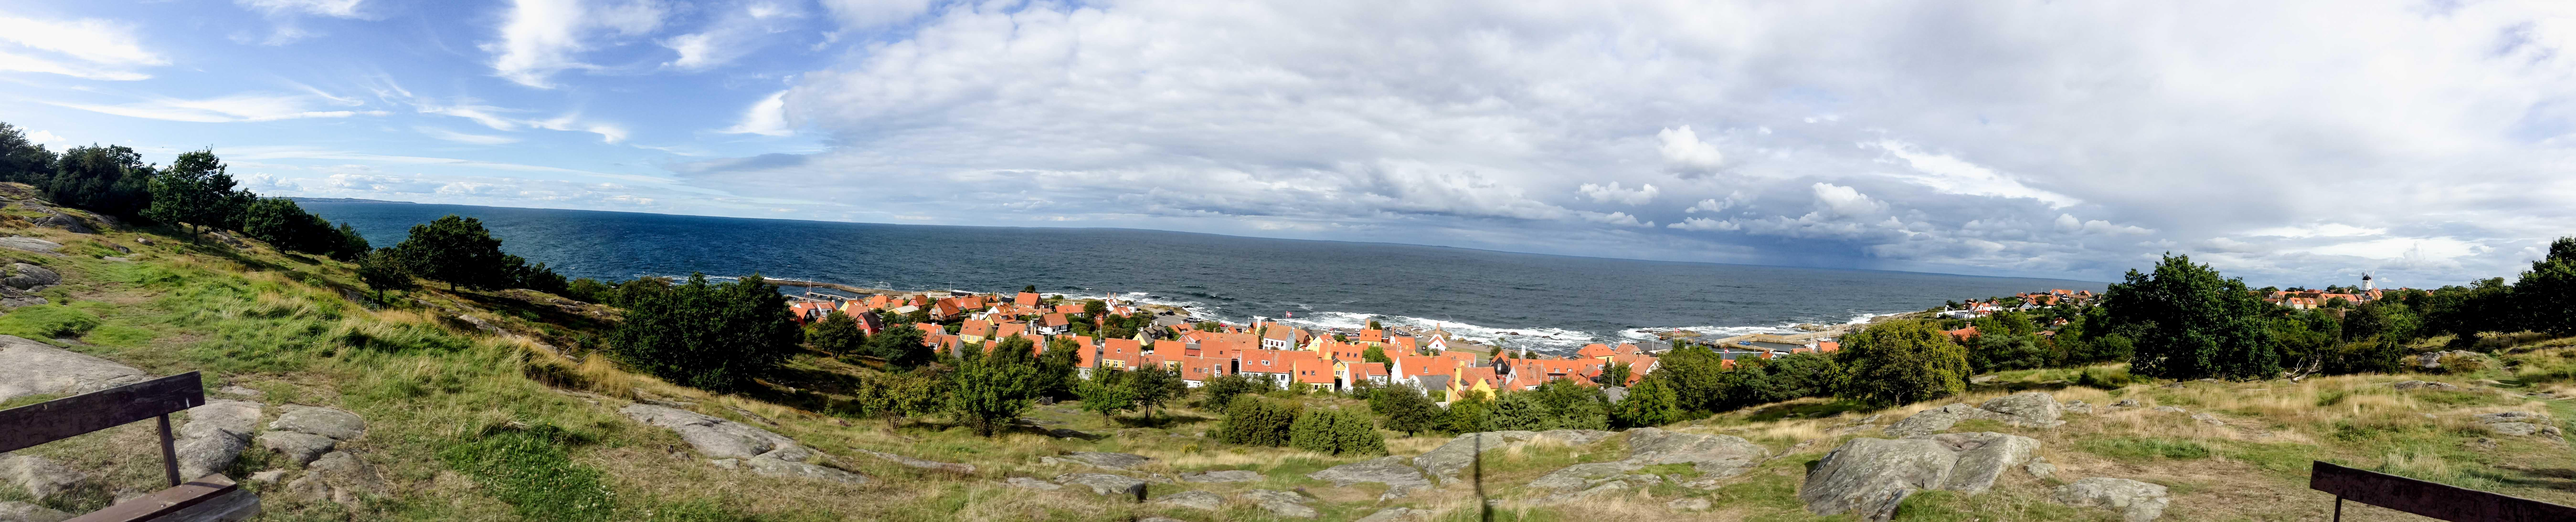 Panorama of Gudhjem